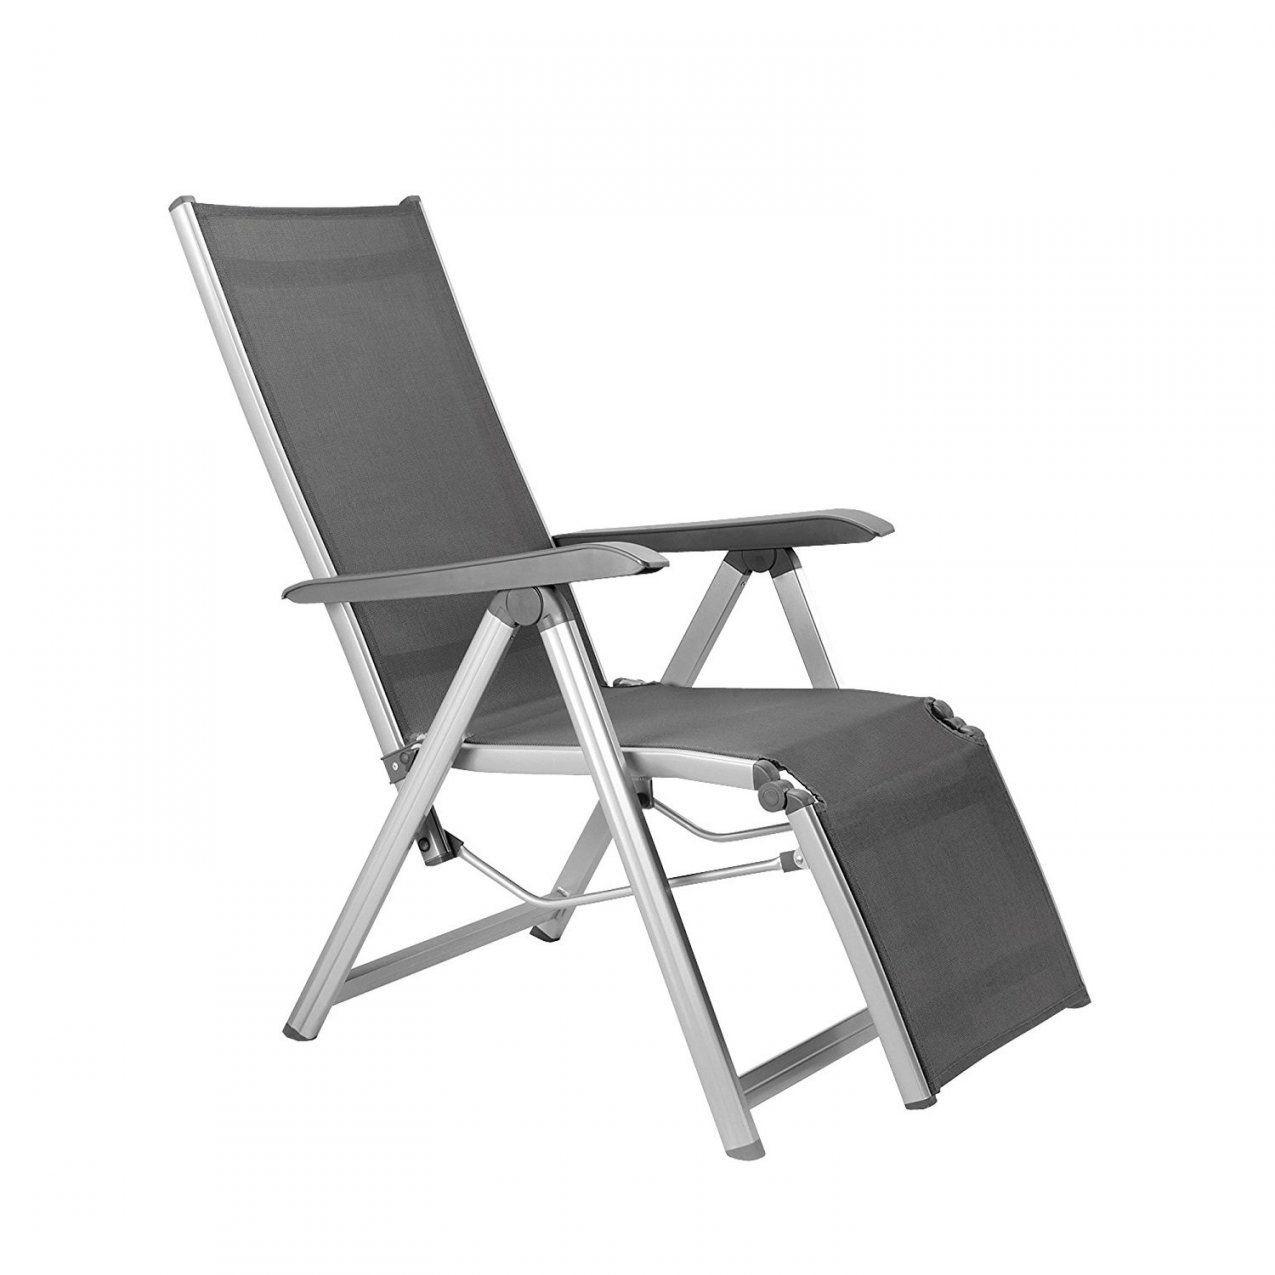 Inspirational Kettler Liegestuhl  Homemaison von Kettler Stapelliege Basic Plus Bild